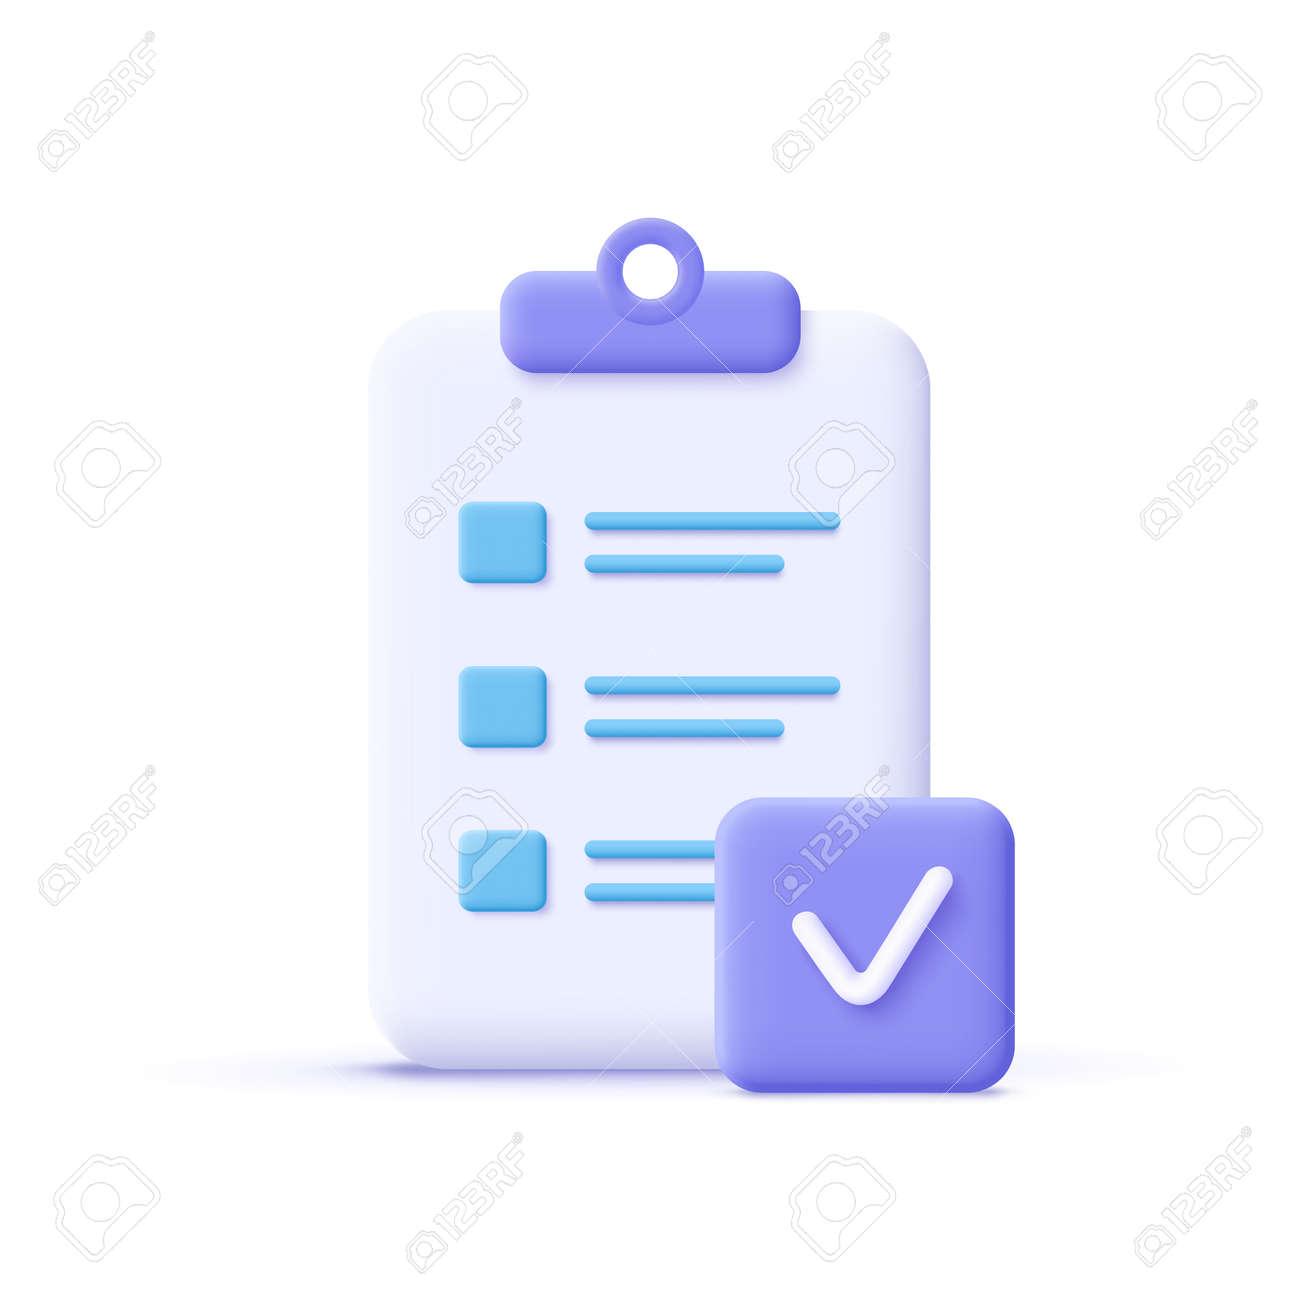 Assignment done icon. Clipboard, checklist symbol. 3d vector illustration. - 171406199